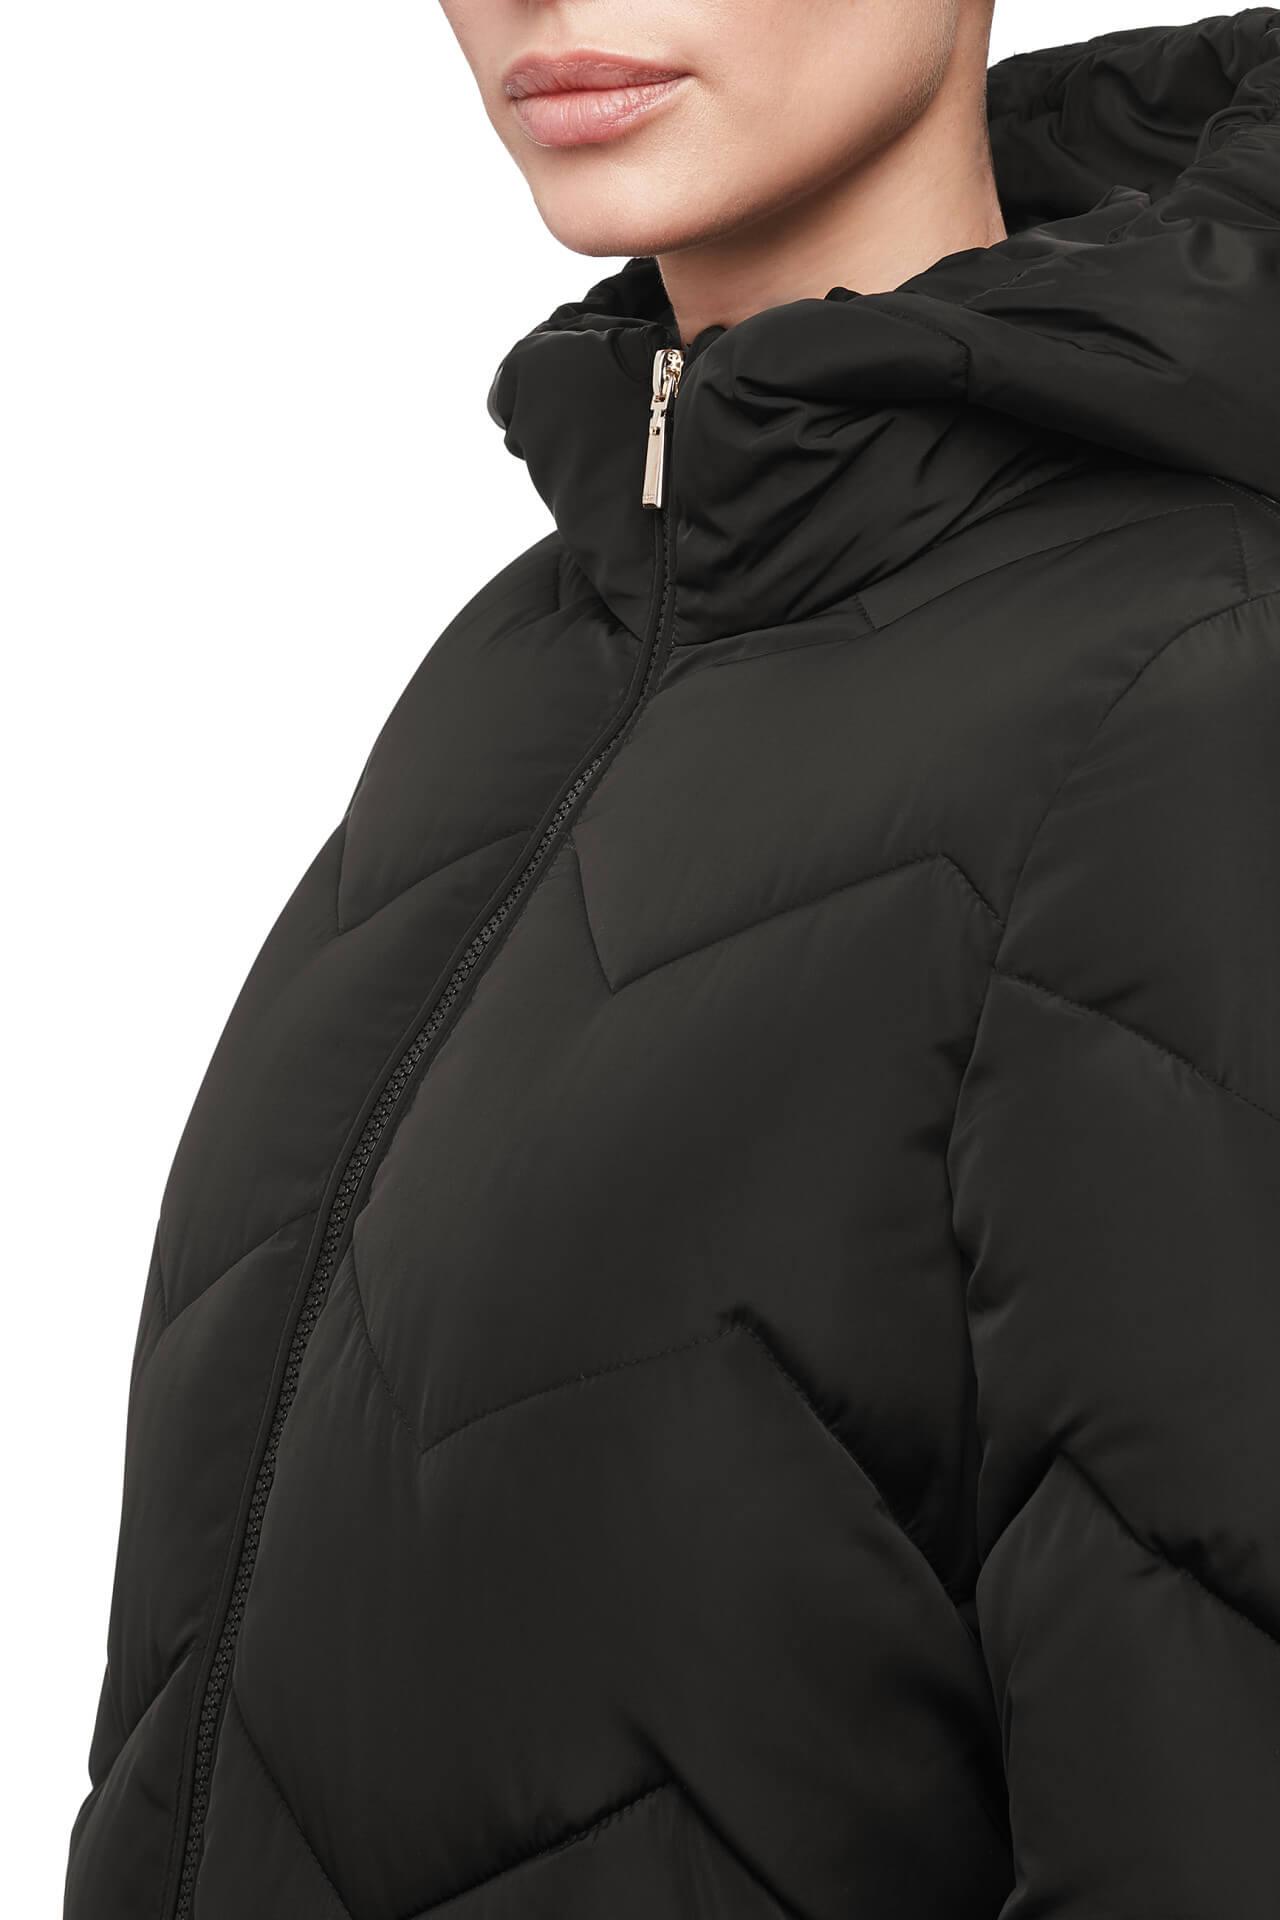 GEOX Női kabát Annya Long JKT Black W8428C-T2506-F9000 Ingyenes ... f4463125e2